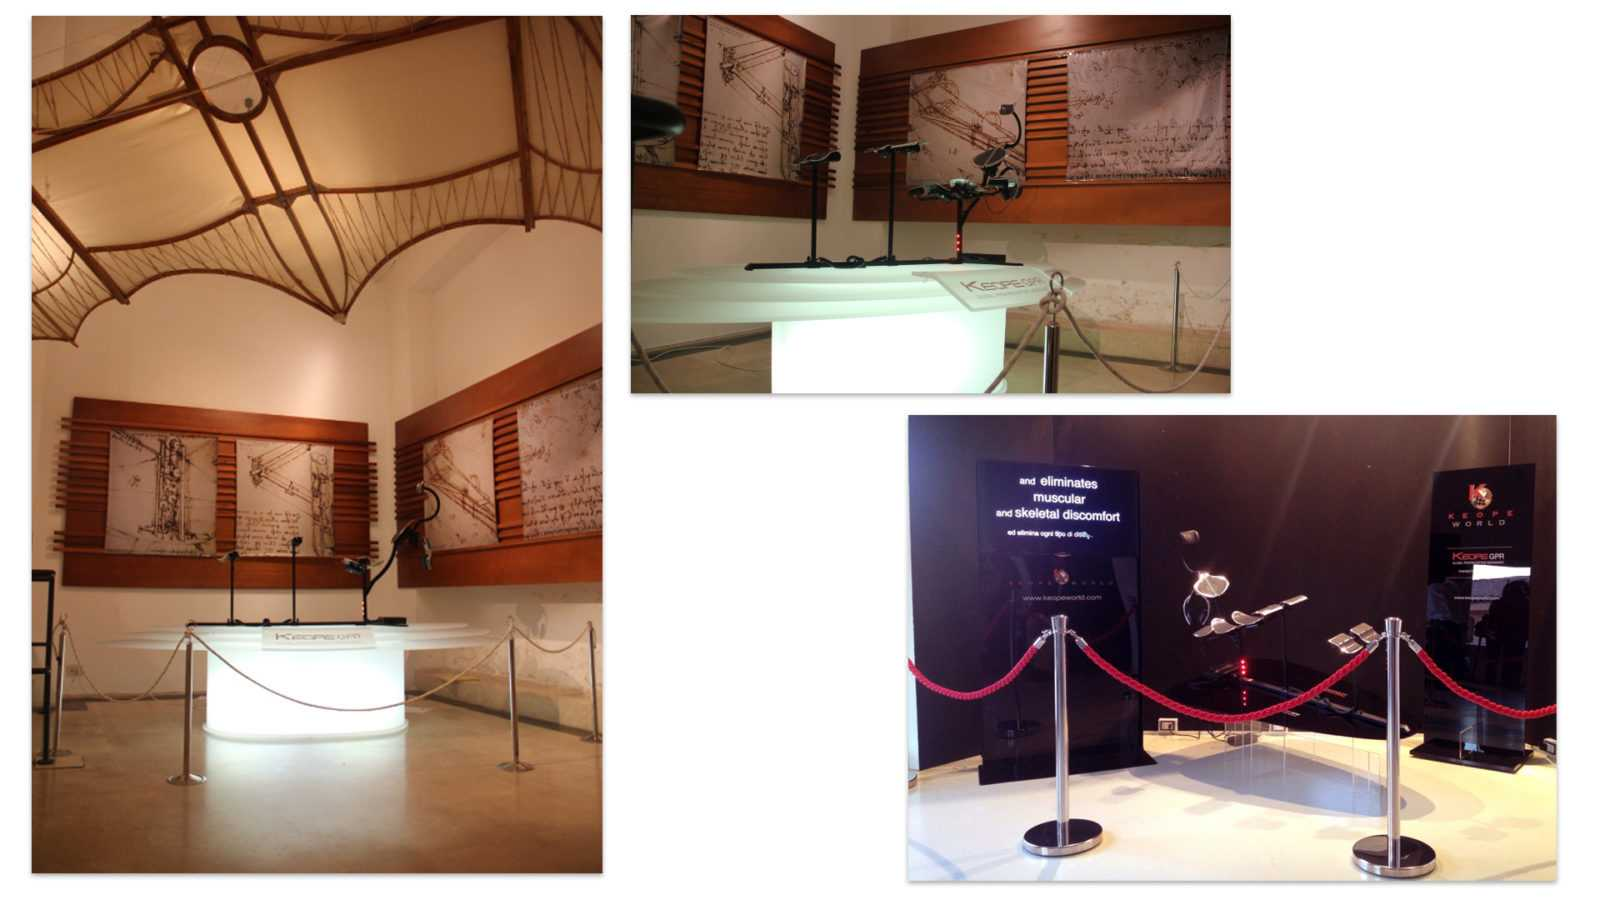 Keope museo leonardo mdm Museum 1 Eccellenze Italiane